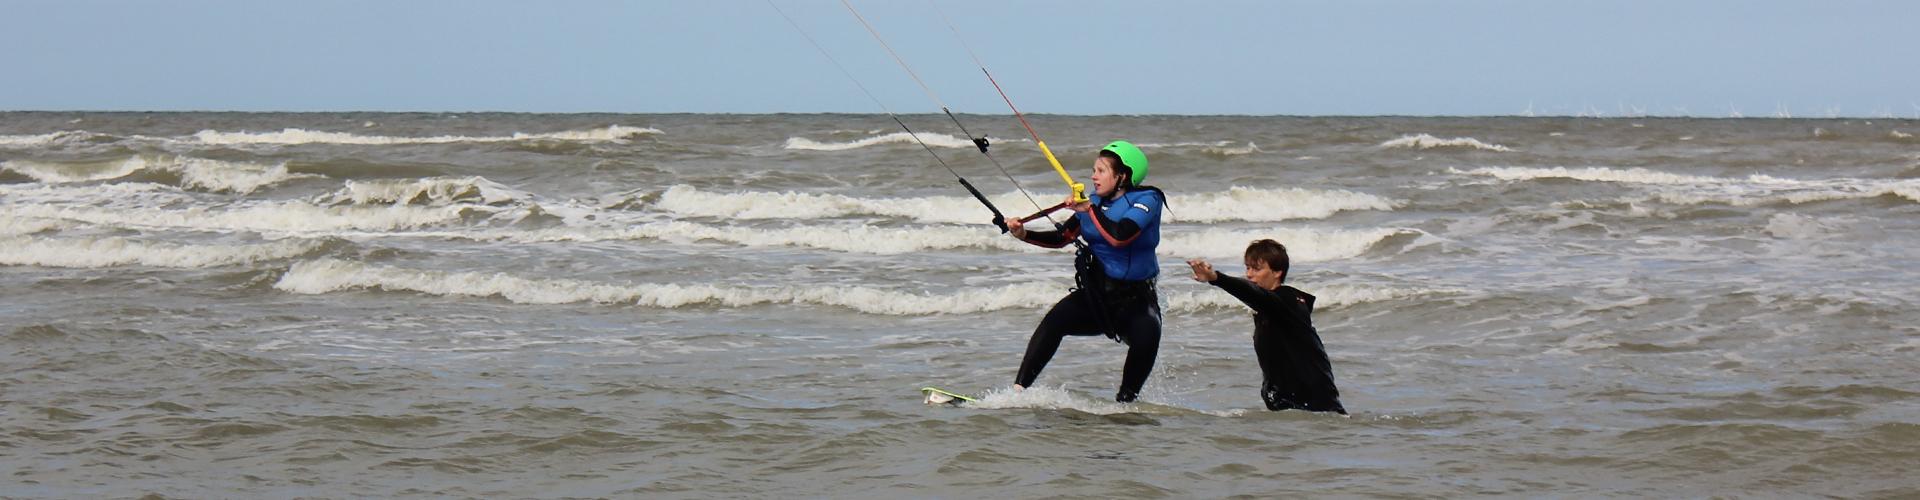 kitesurf cursus mobiel